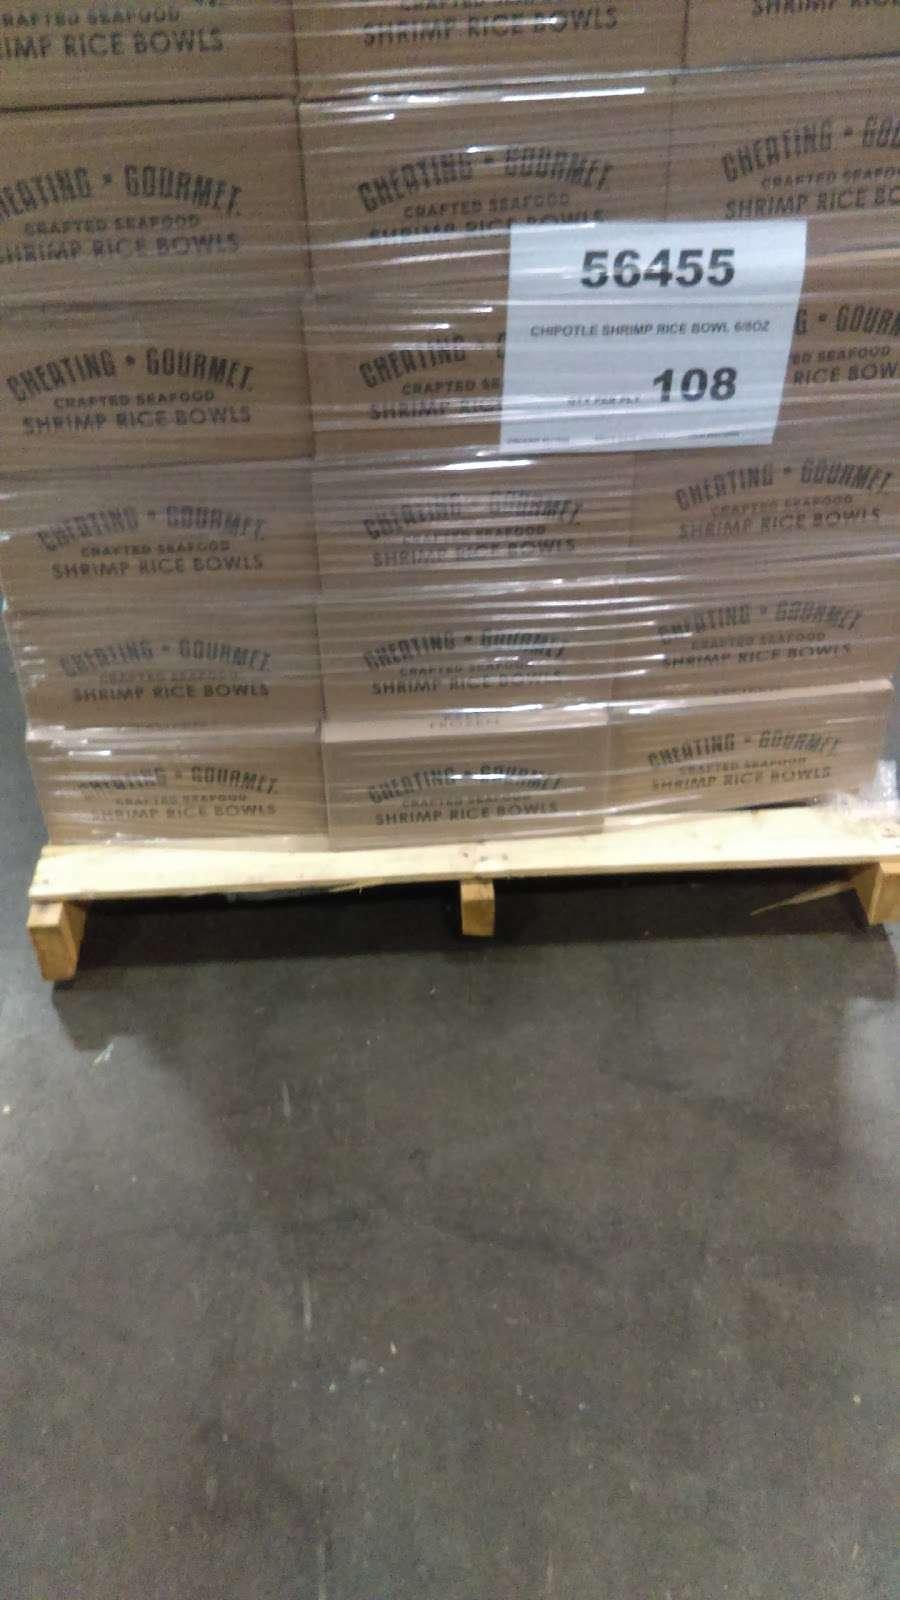 Roundys Supermarkets Distribution Warehouse - storage  | Photo 9 of 10 | Address: 1120 Distribution Ct, Oconomowoc, WI 53066, USA | Phone: (262) 560-3300